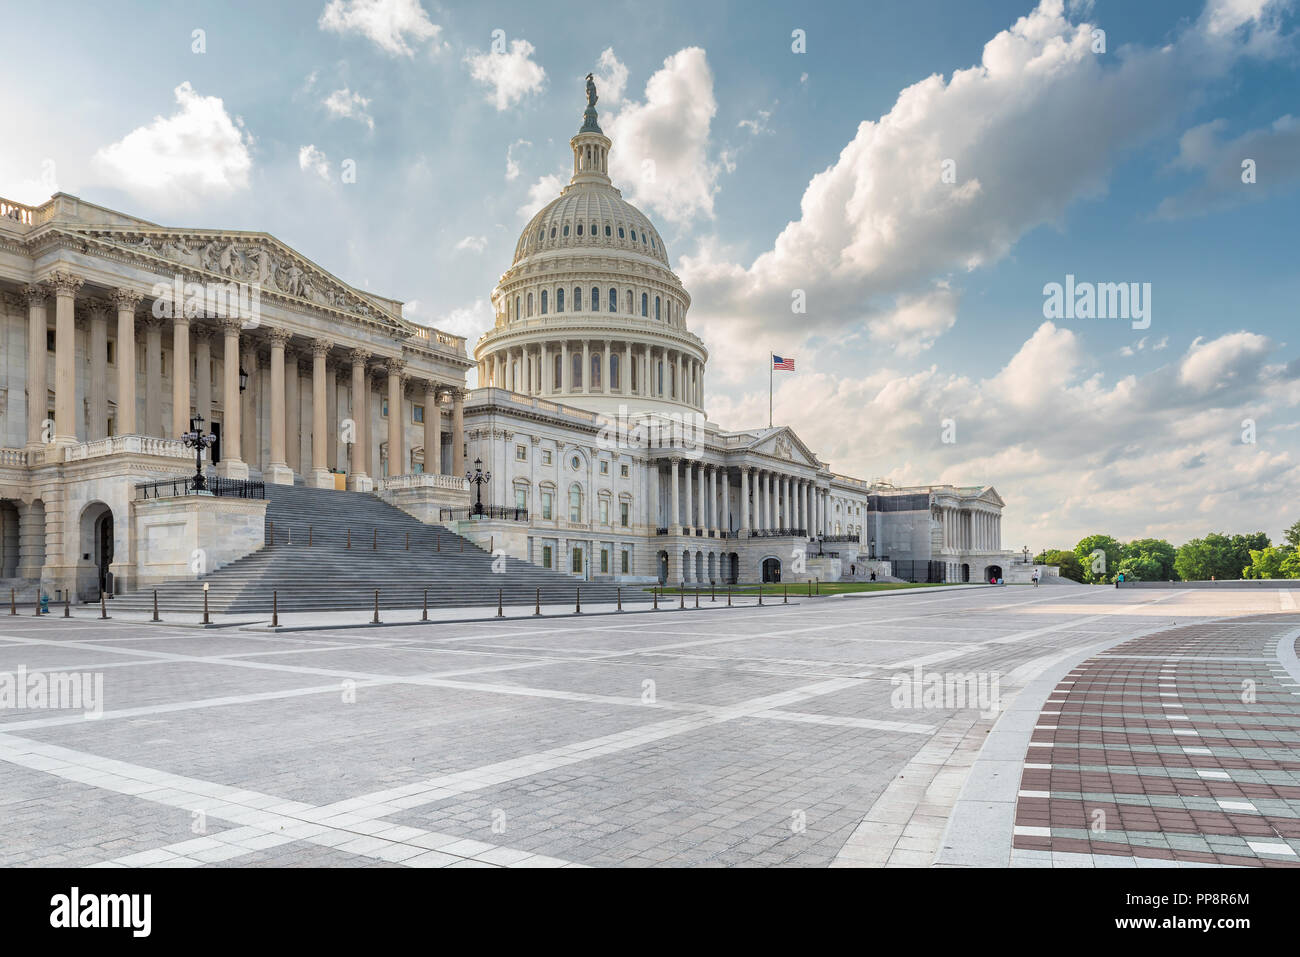 Washington DC, United States Capitol building at summertime - Stock Image